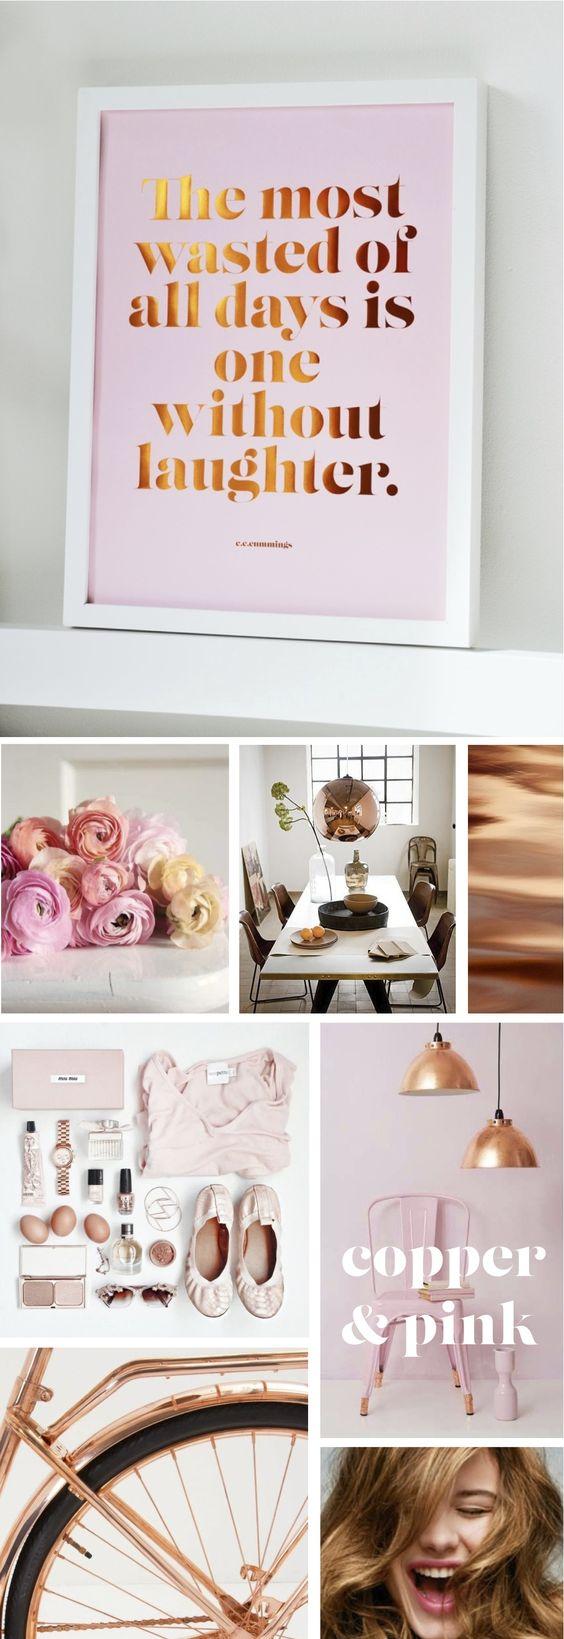 NEW IN THE SHOP - Laughter Copper Foil Poster - £22.00 copper, pink, copper foil